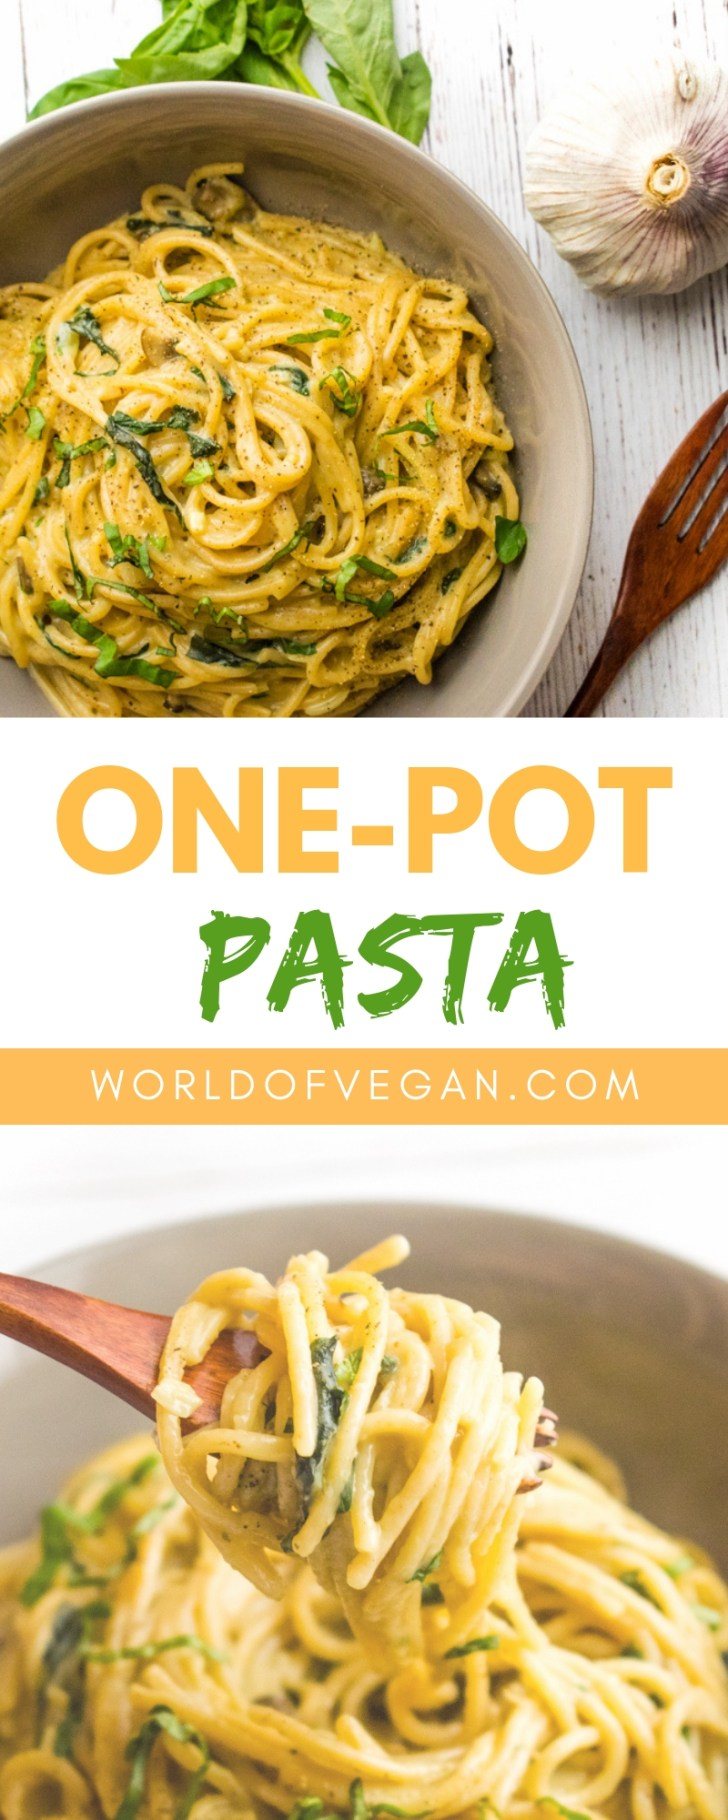 One Pot Pasta | WorldofVegan.com | #Vegan #vegetarian #dinner #pasta #recipe #plantbased #dairyfree